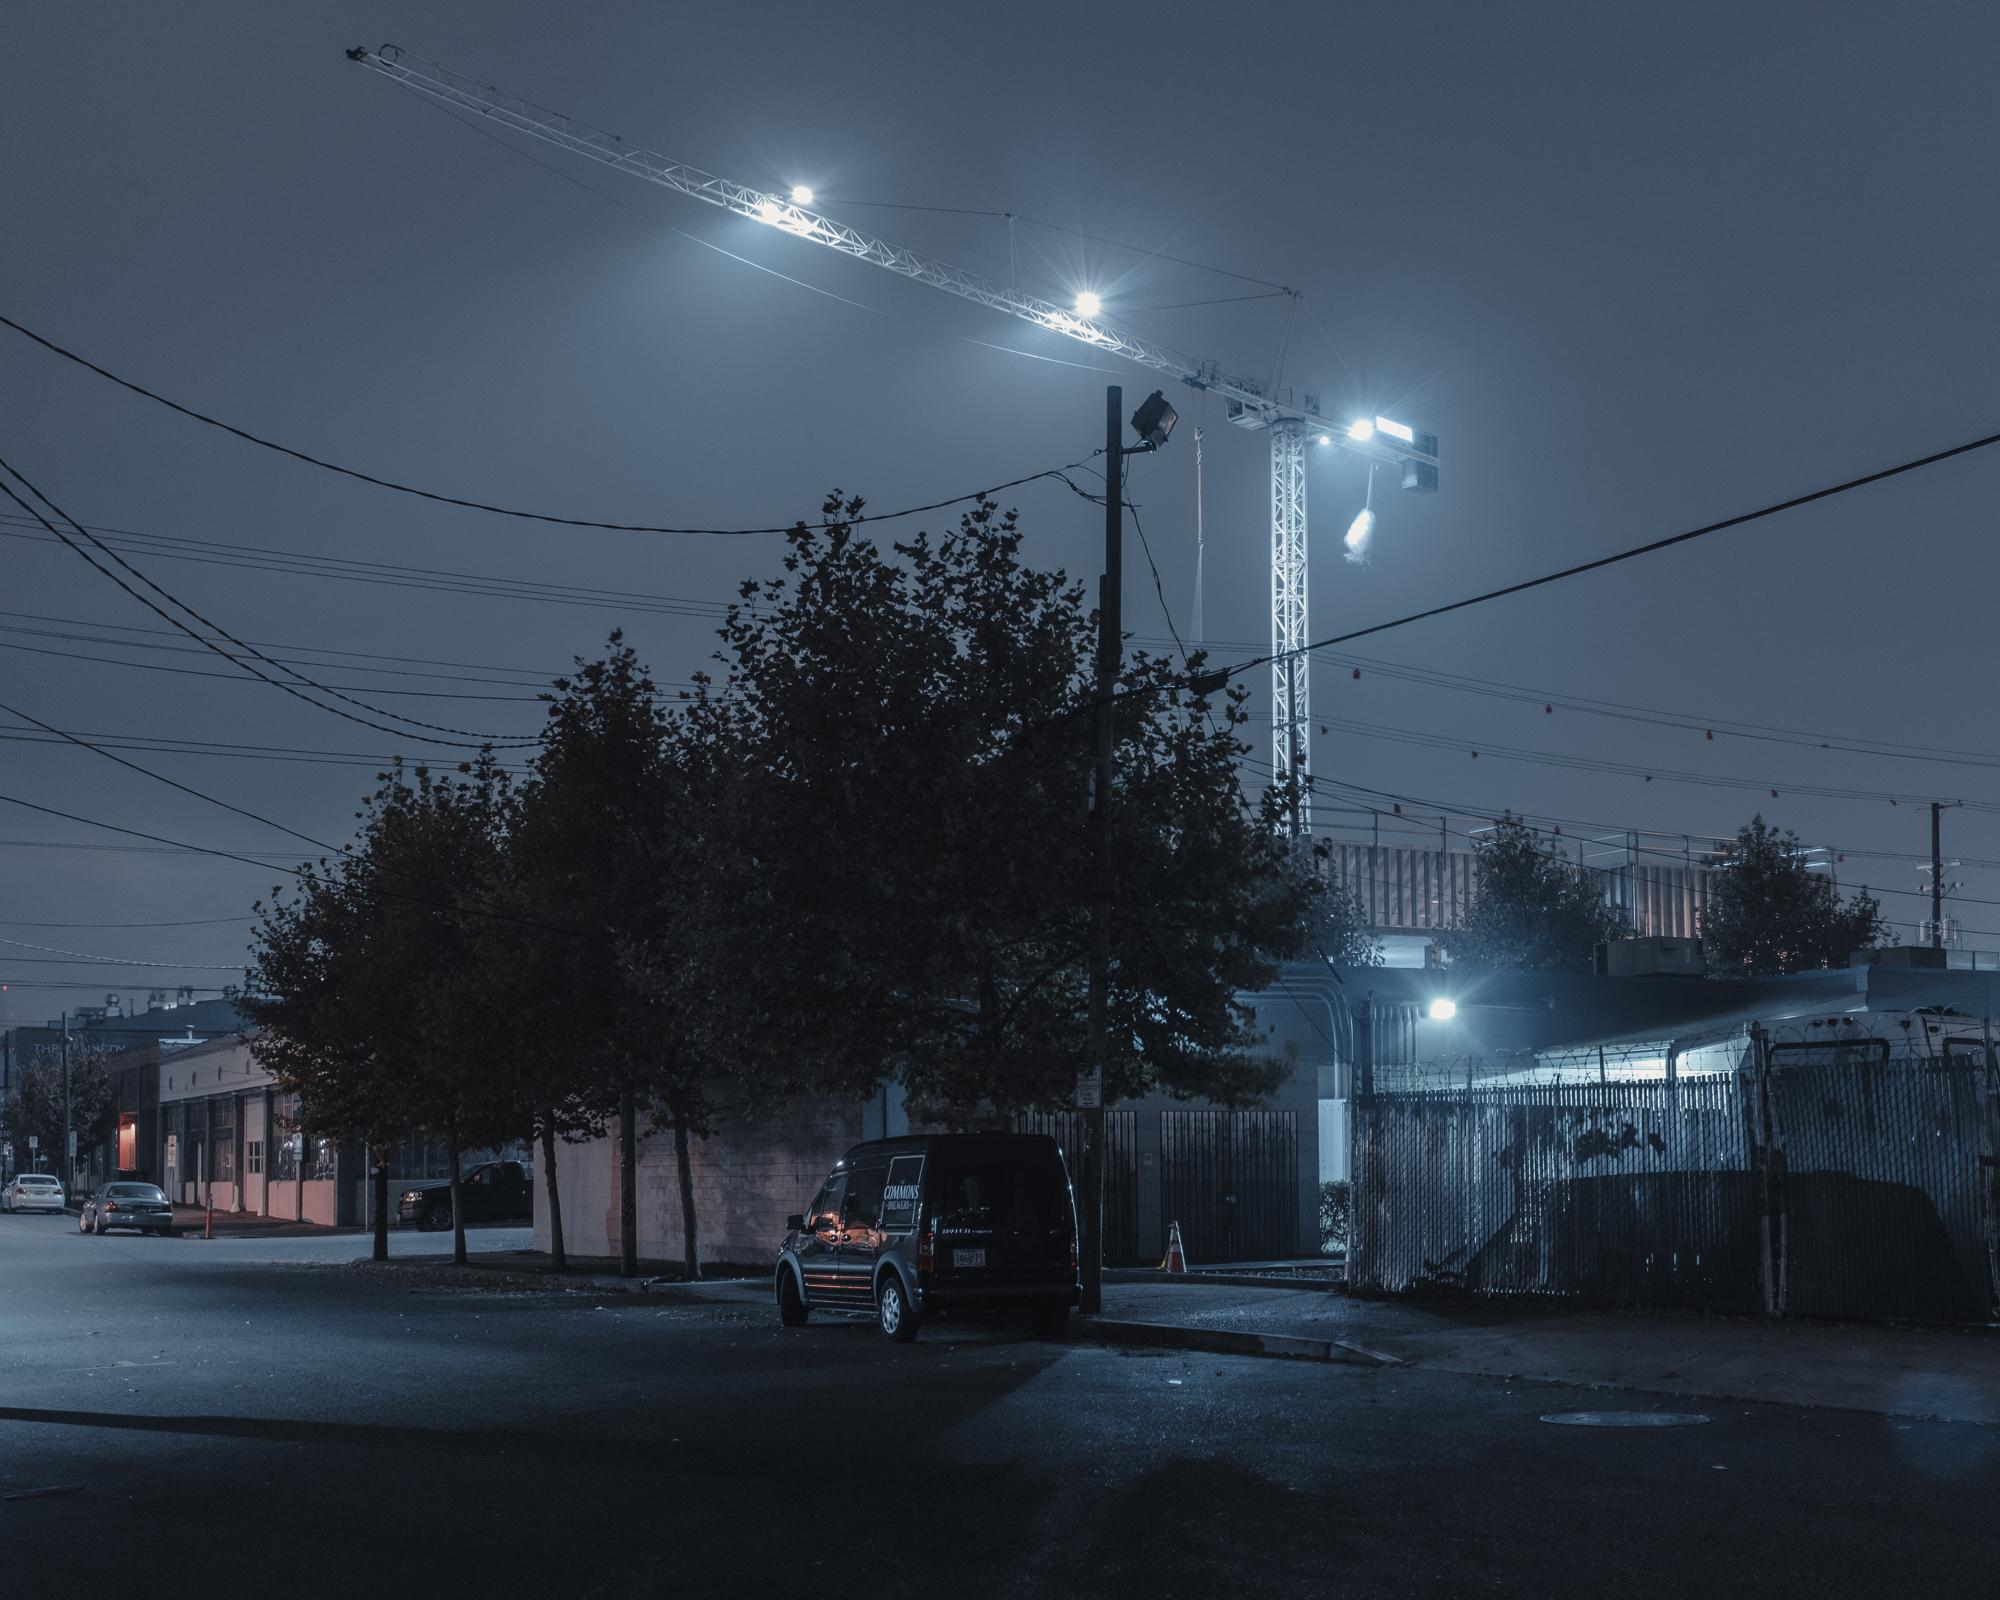 Nights-47.jpg